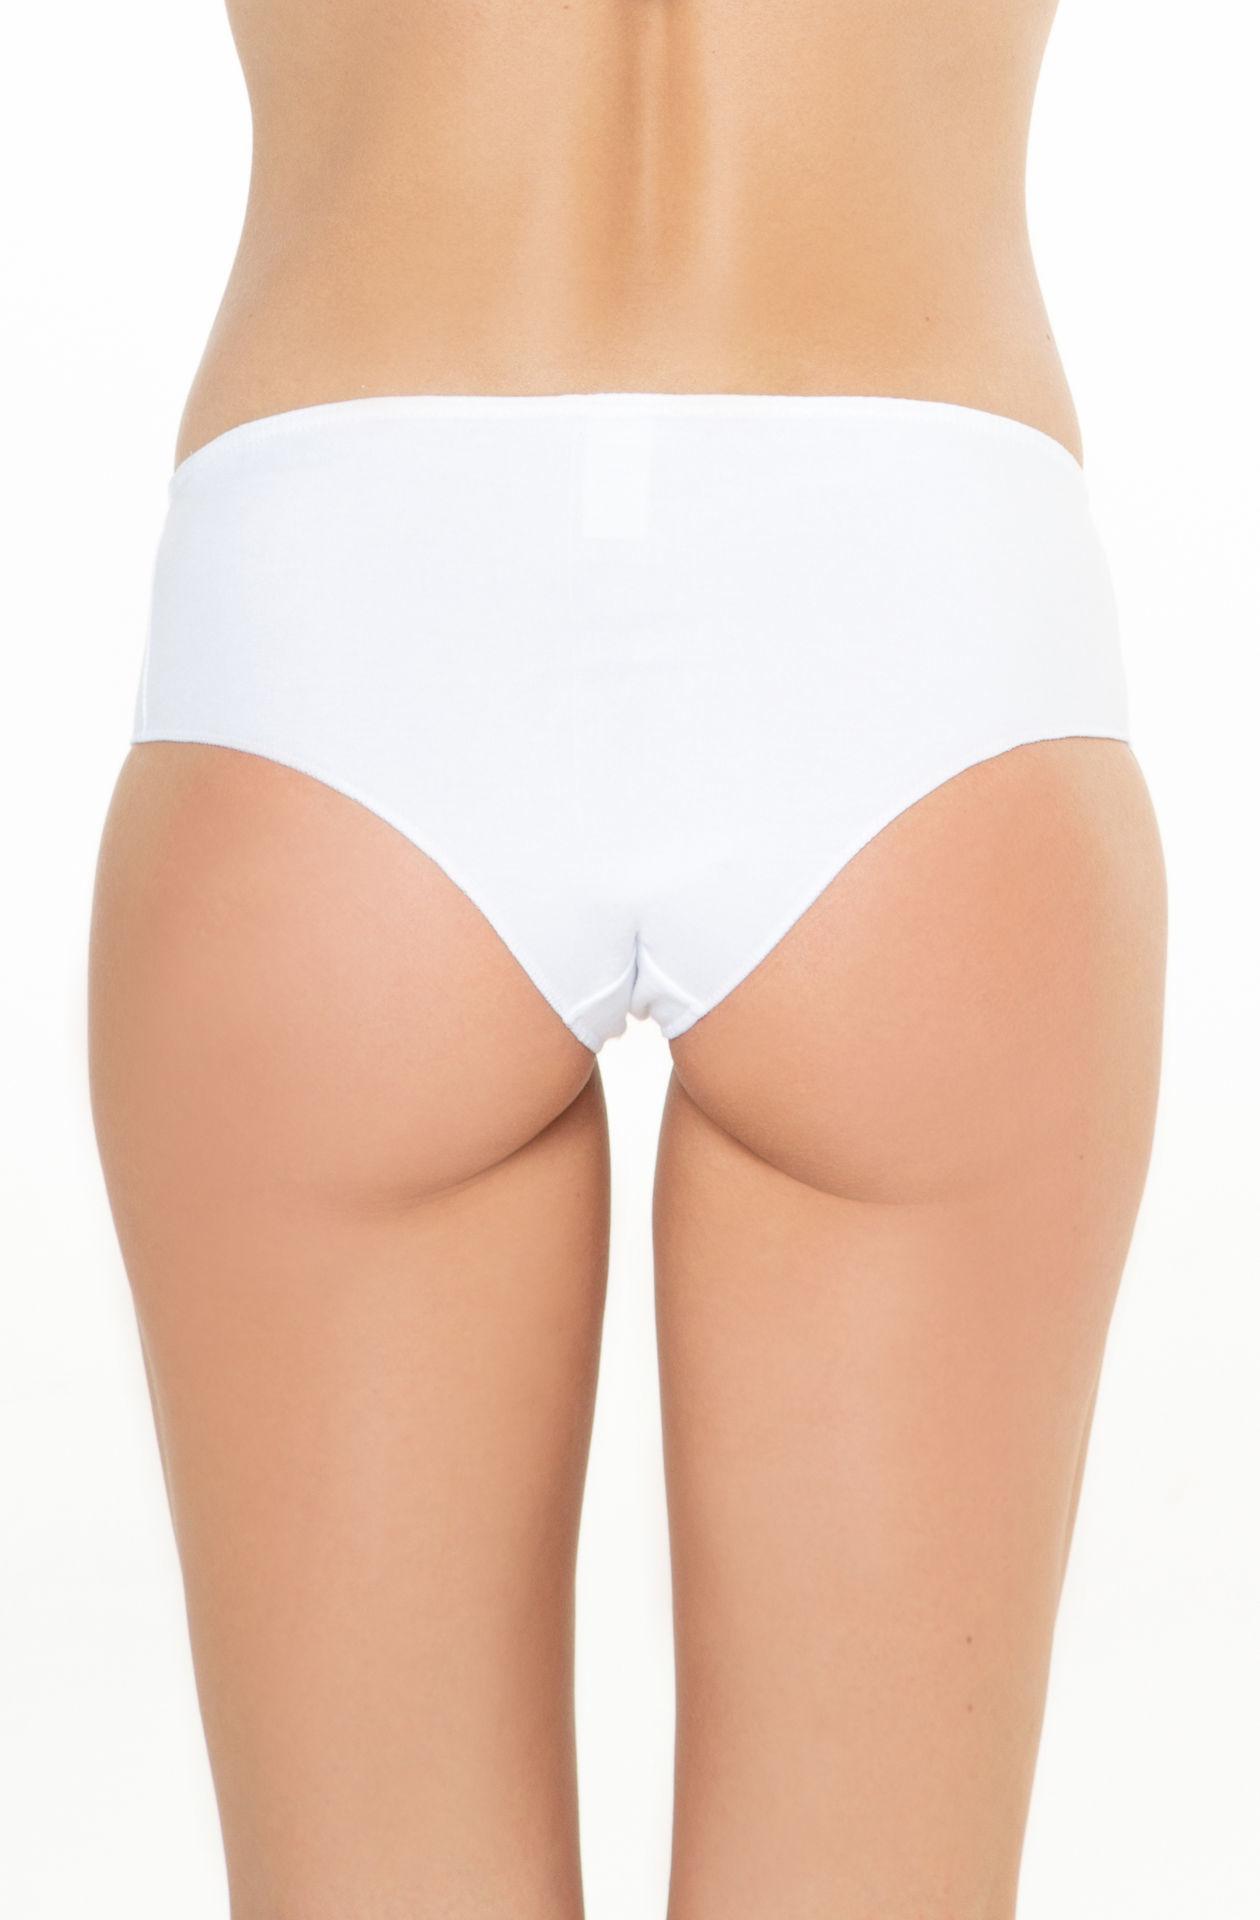 Picture of Women's slip